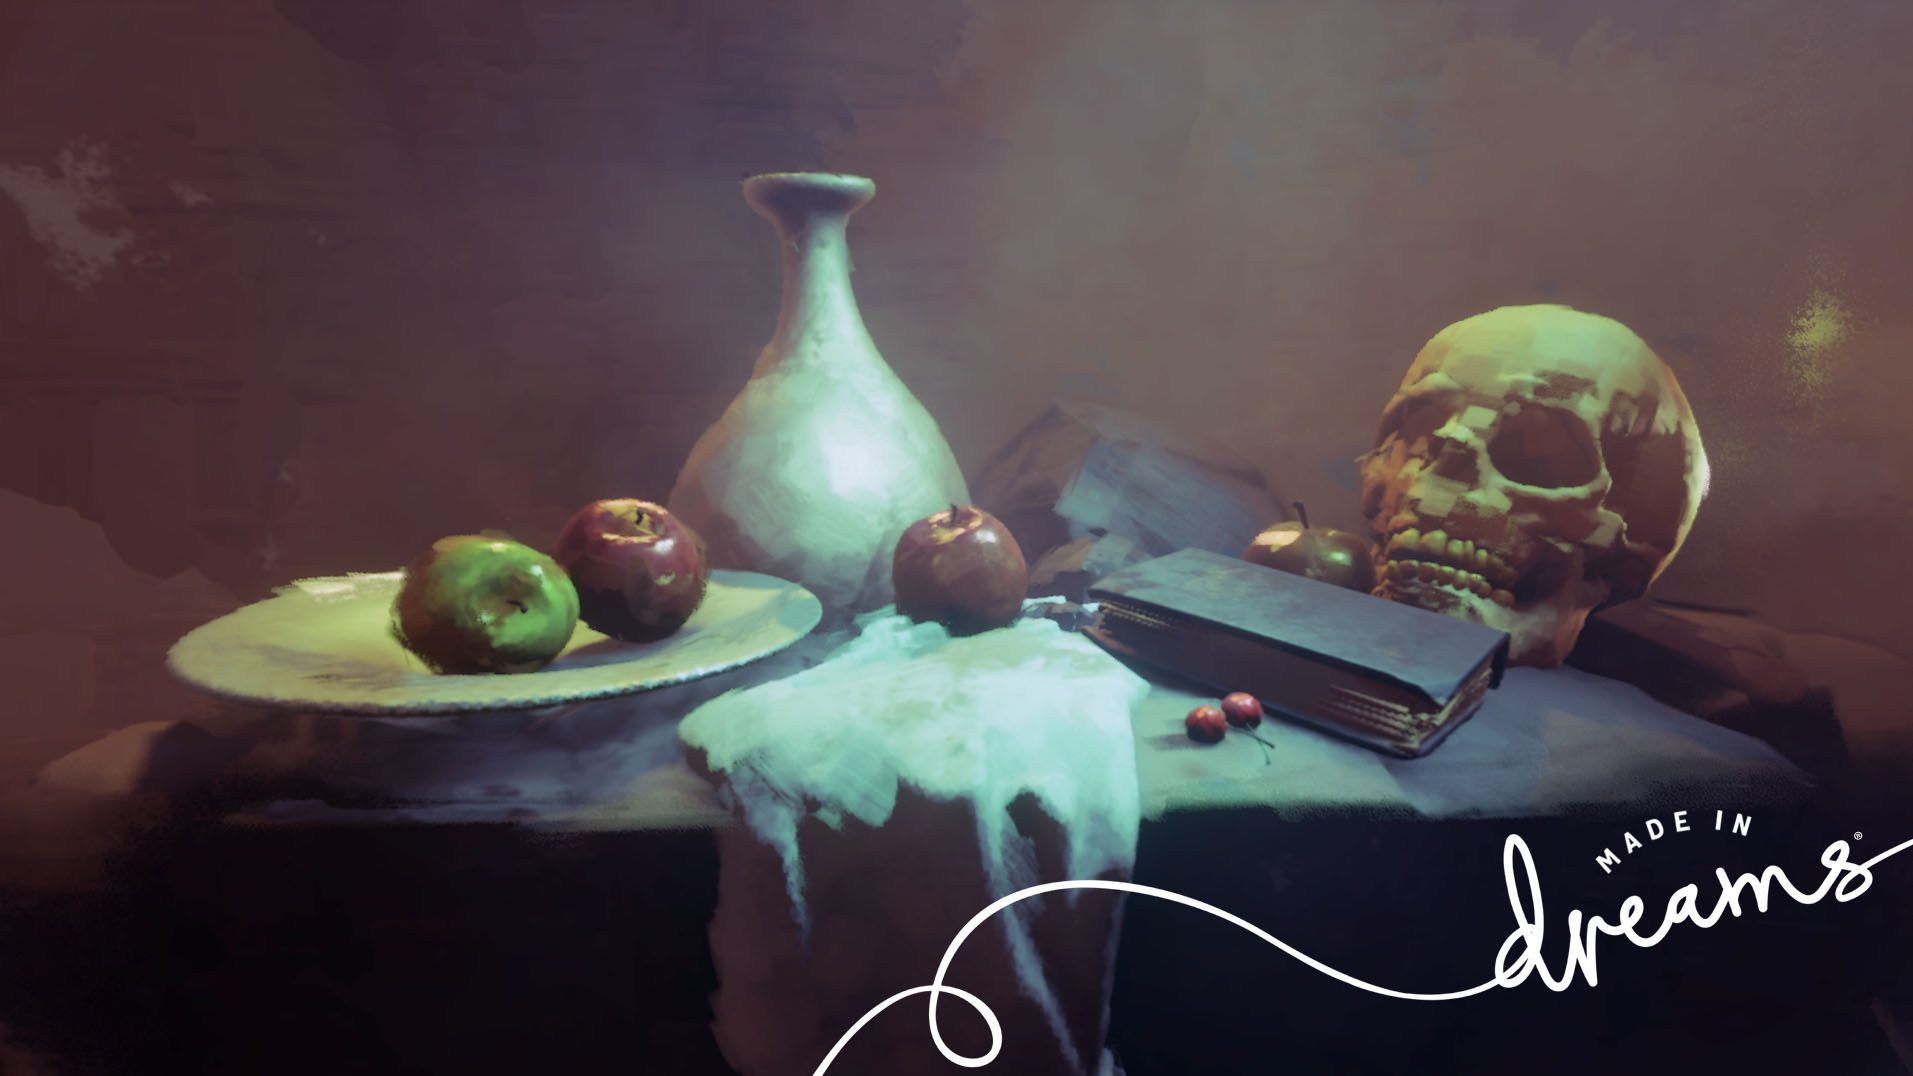 jokAeQk8dNnTHbgnDmTWxa - From LittleBigPlanet to Dreams: Media Molecule and the future of DIY gaming